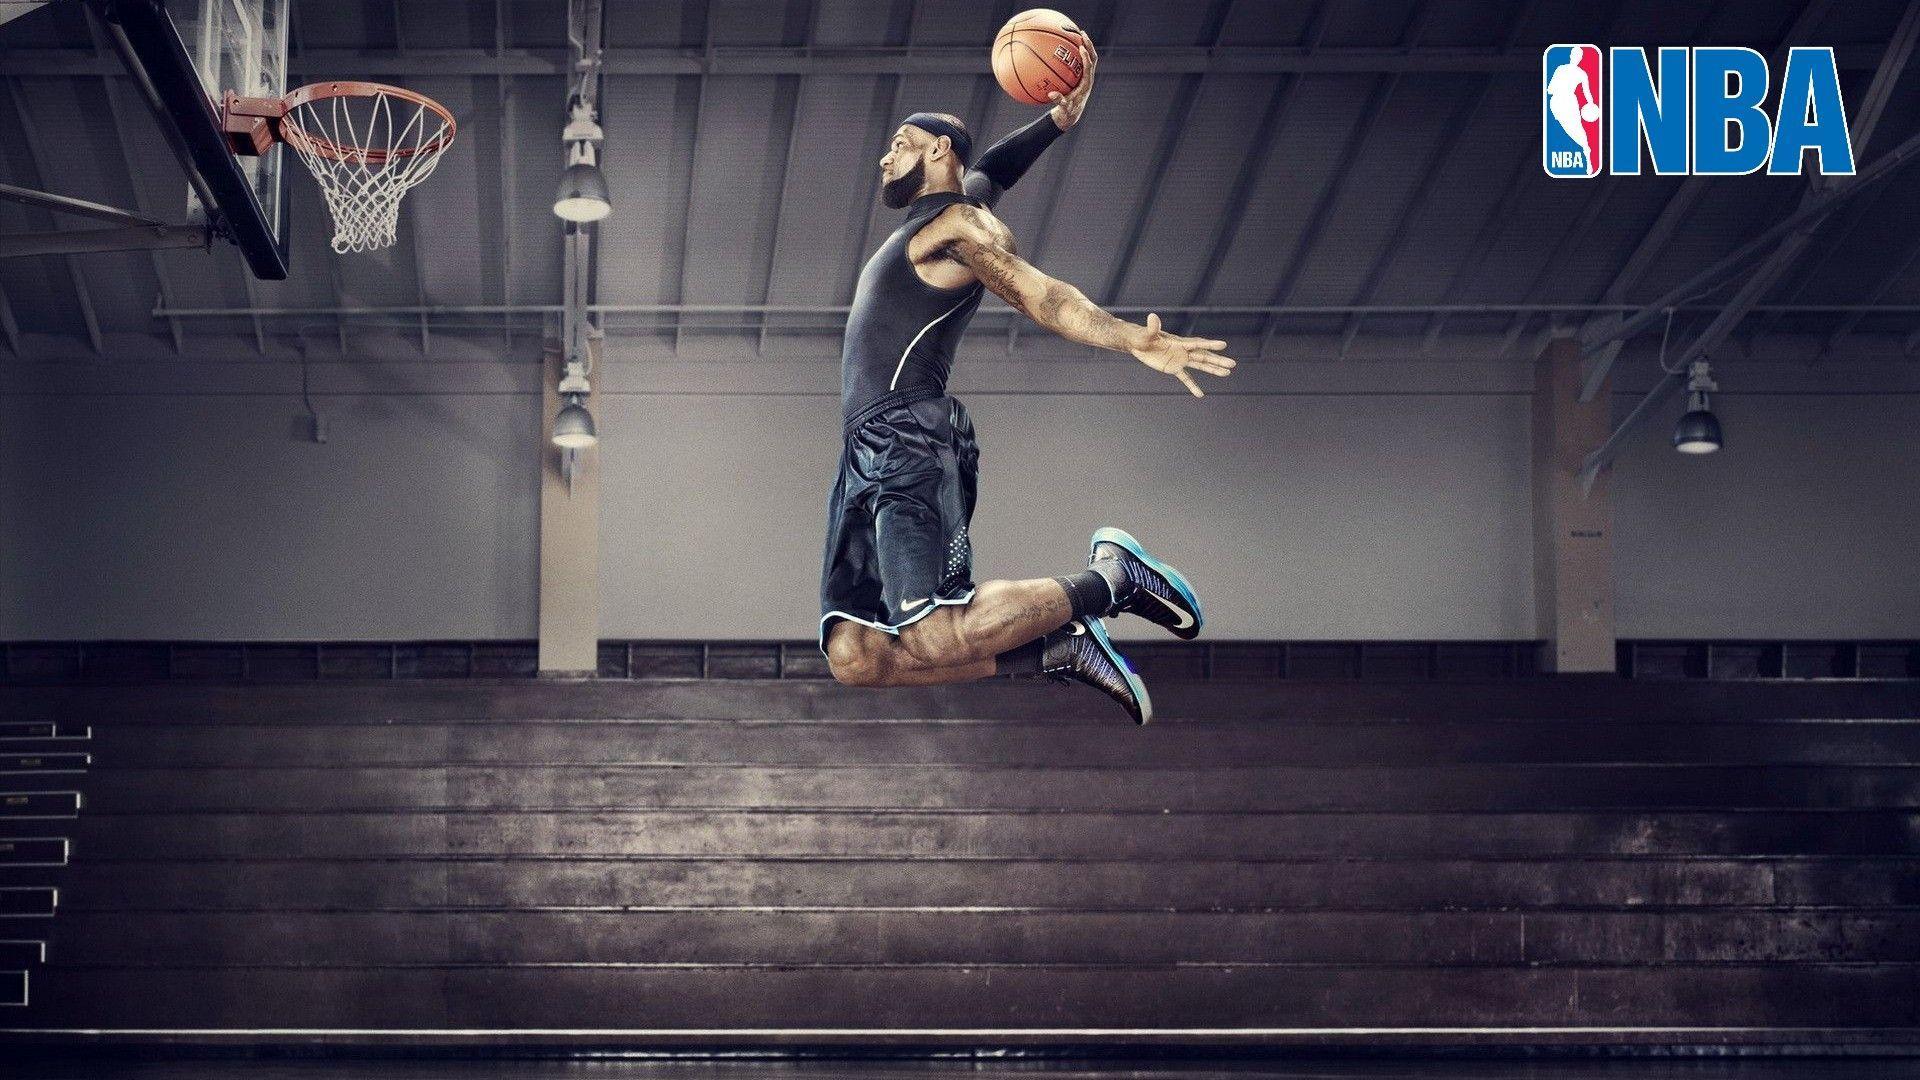 Basketball Court Wallpapers Top Free Basketball Court